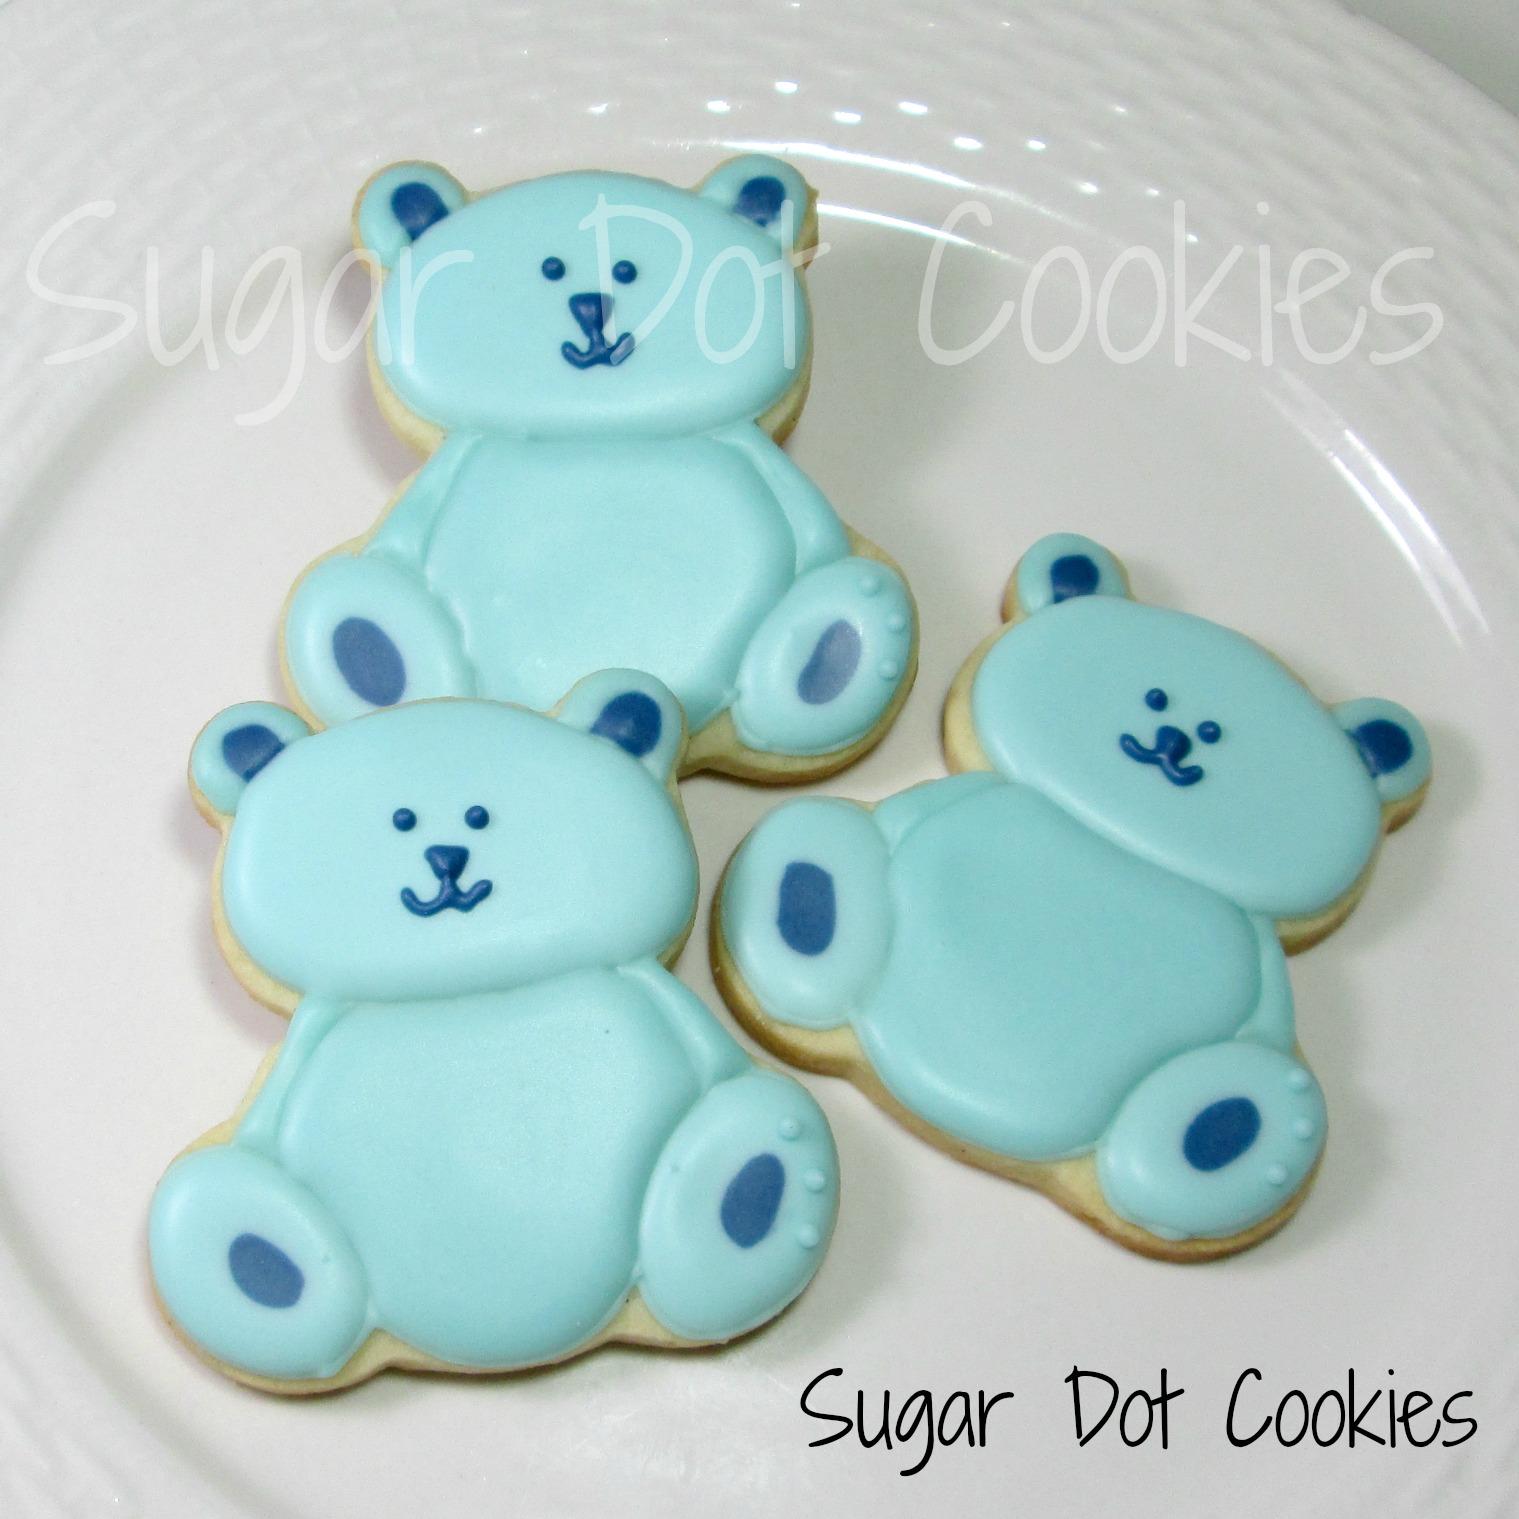 Sugar Dot Cookies January 2013